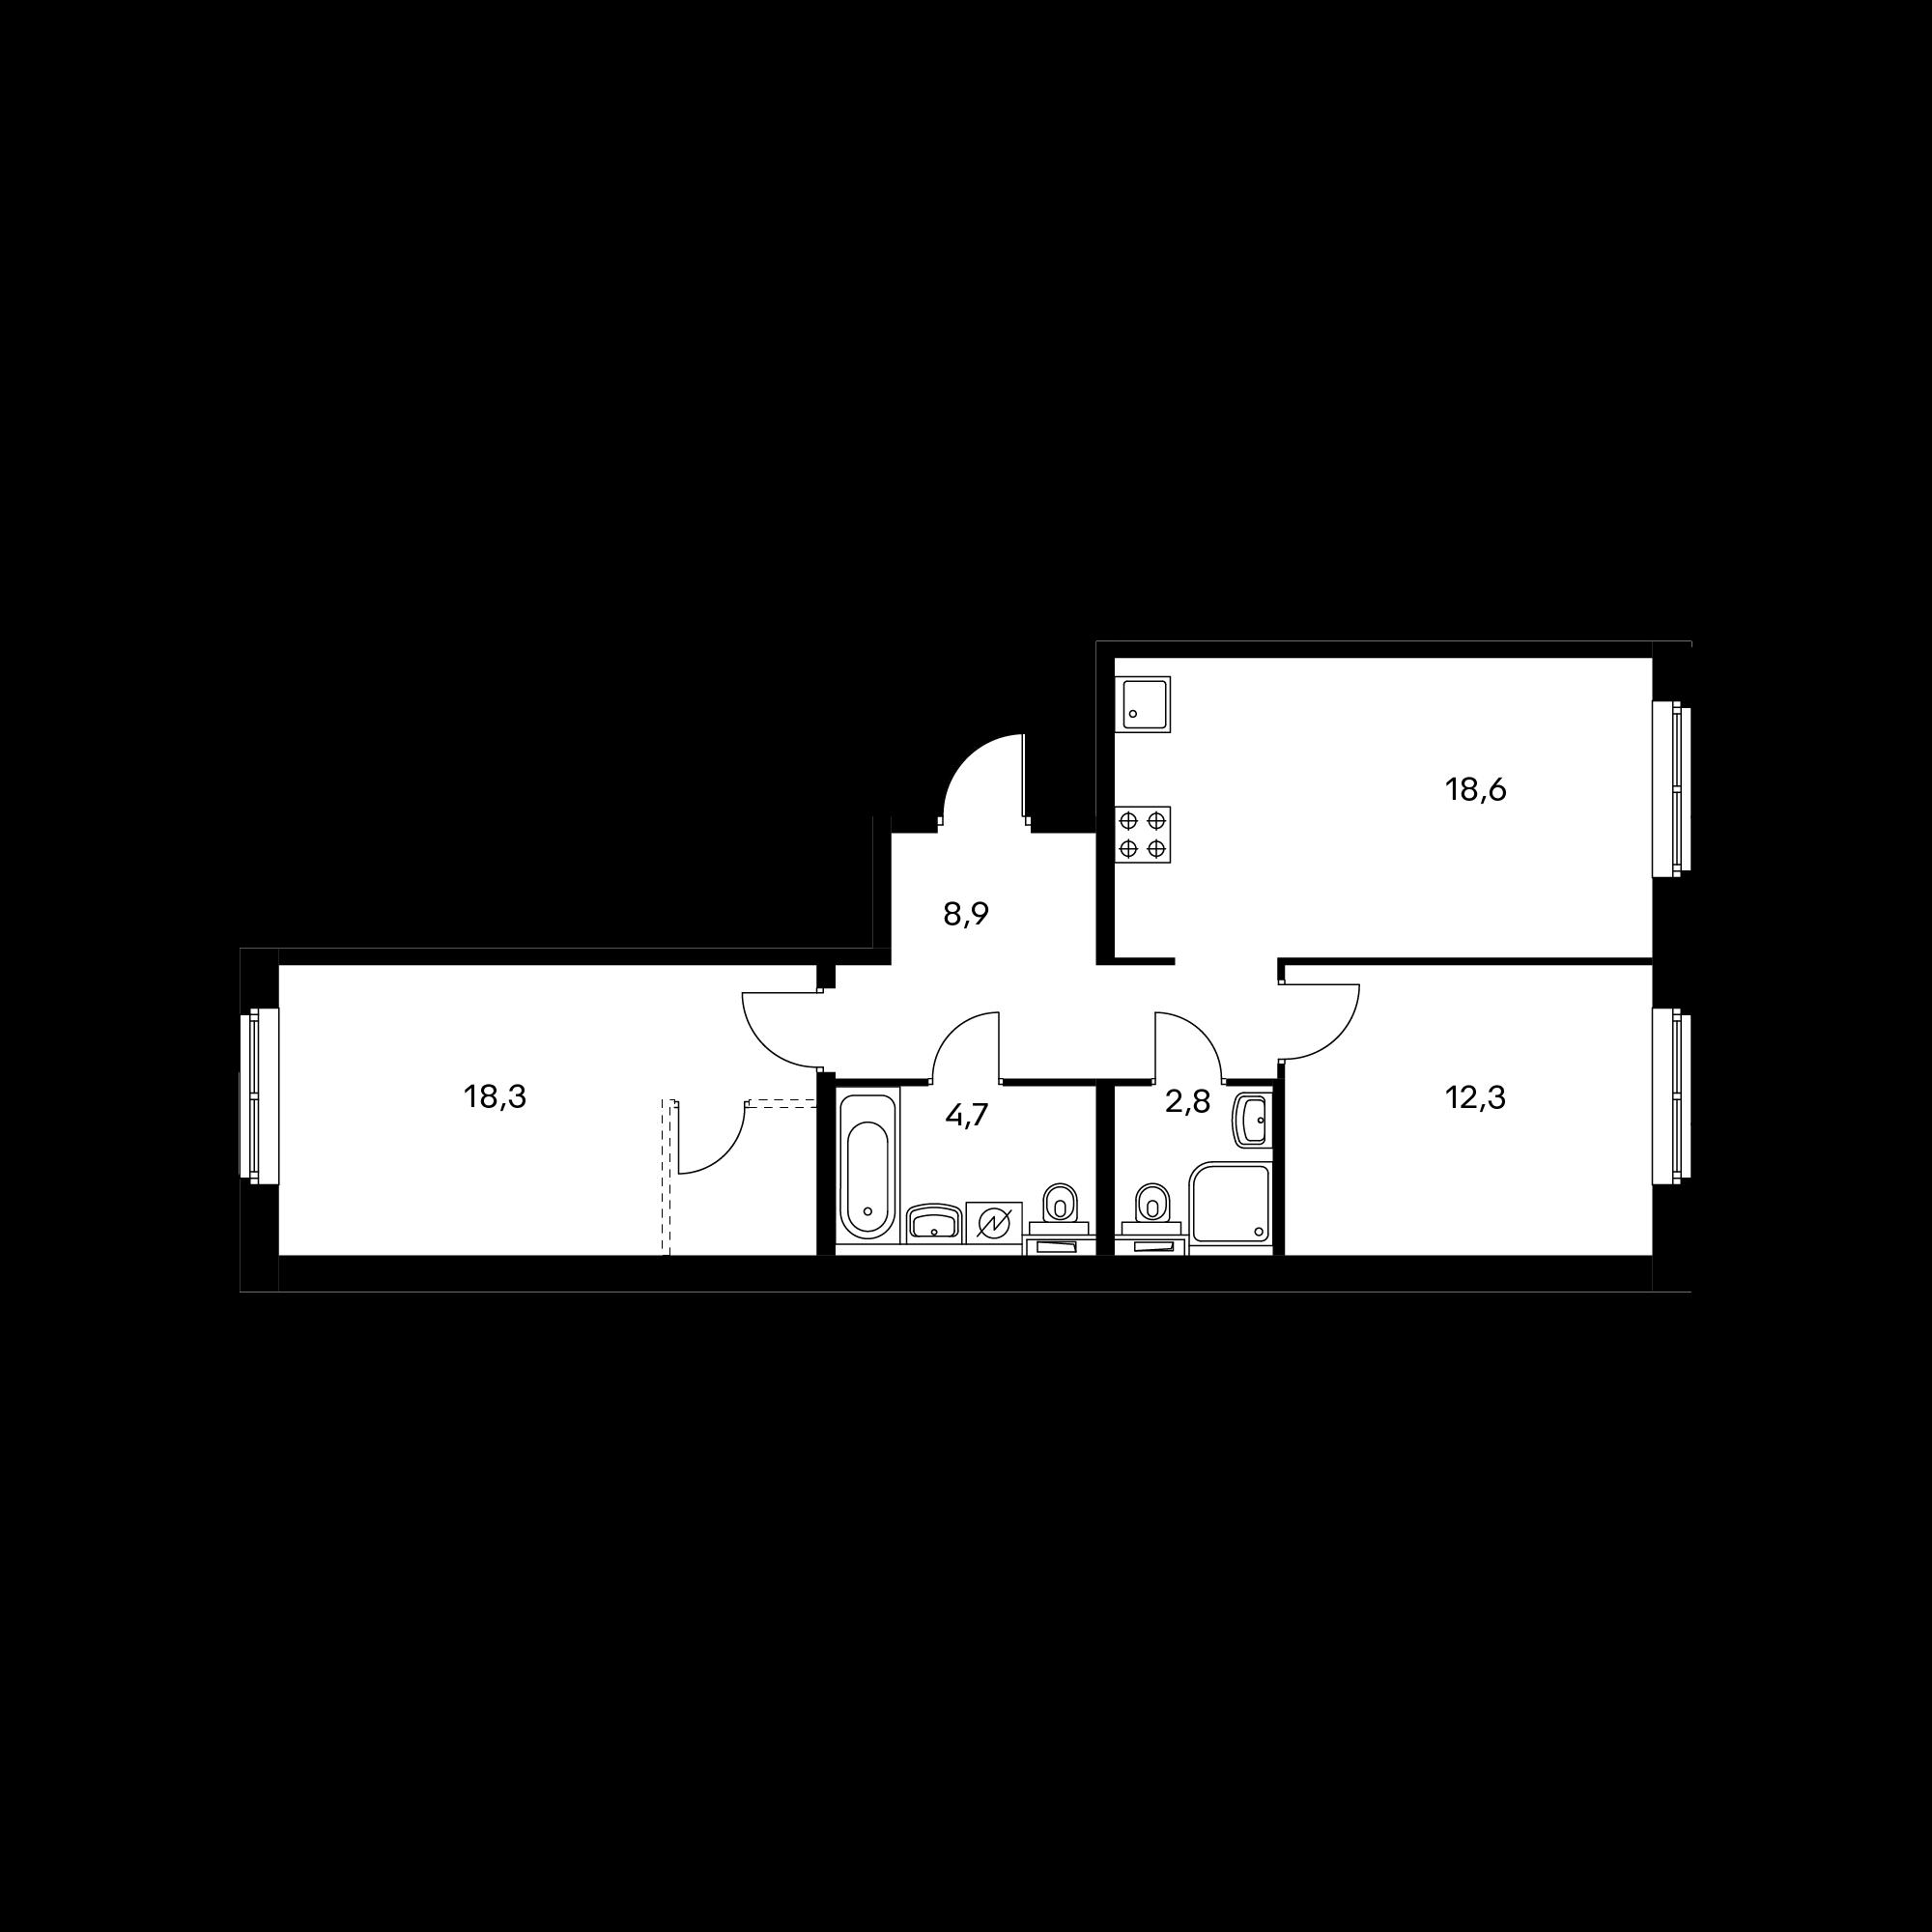 2EL3_6.6-2*